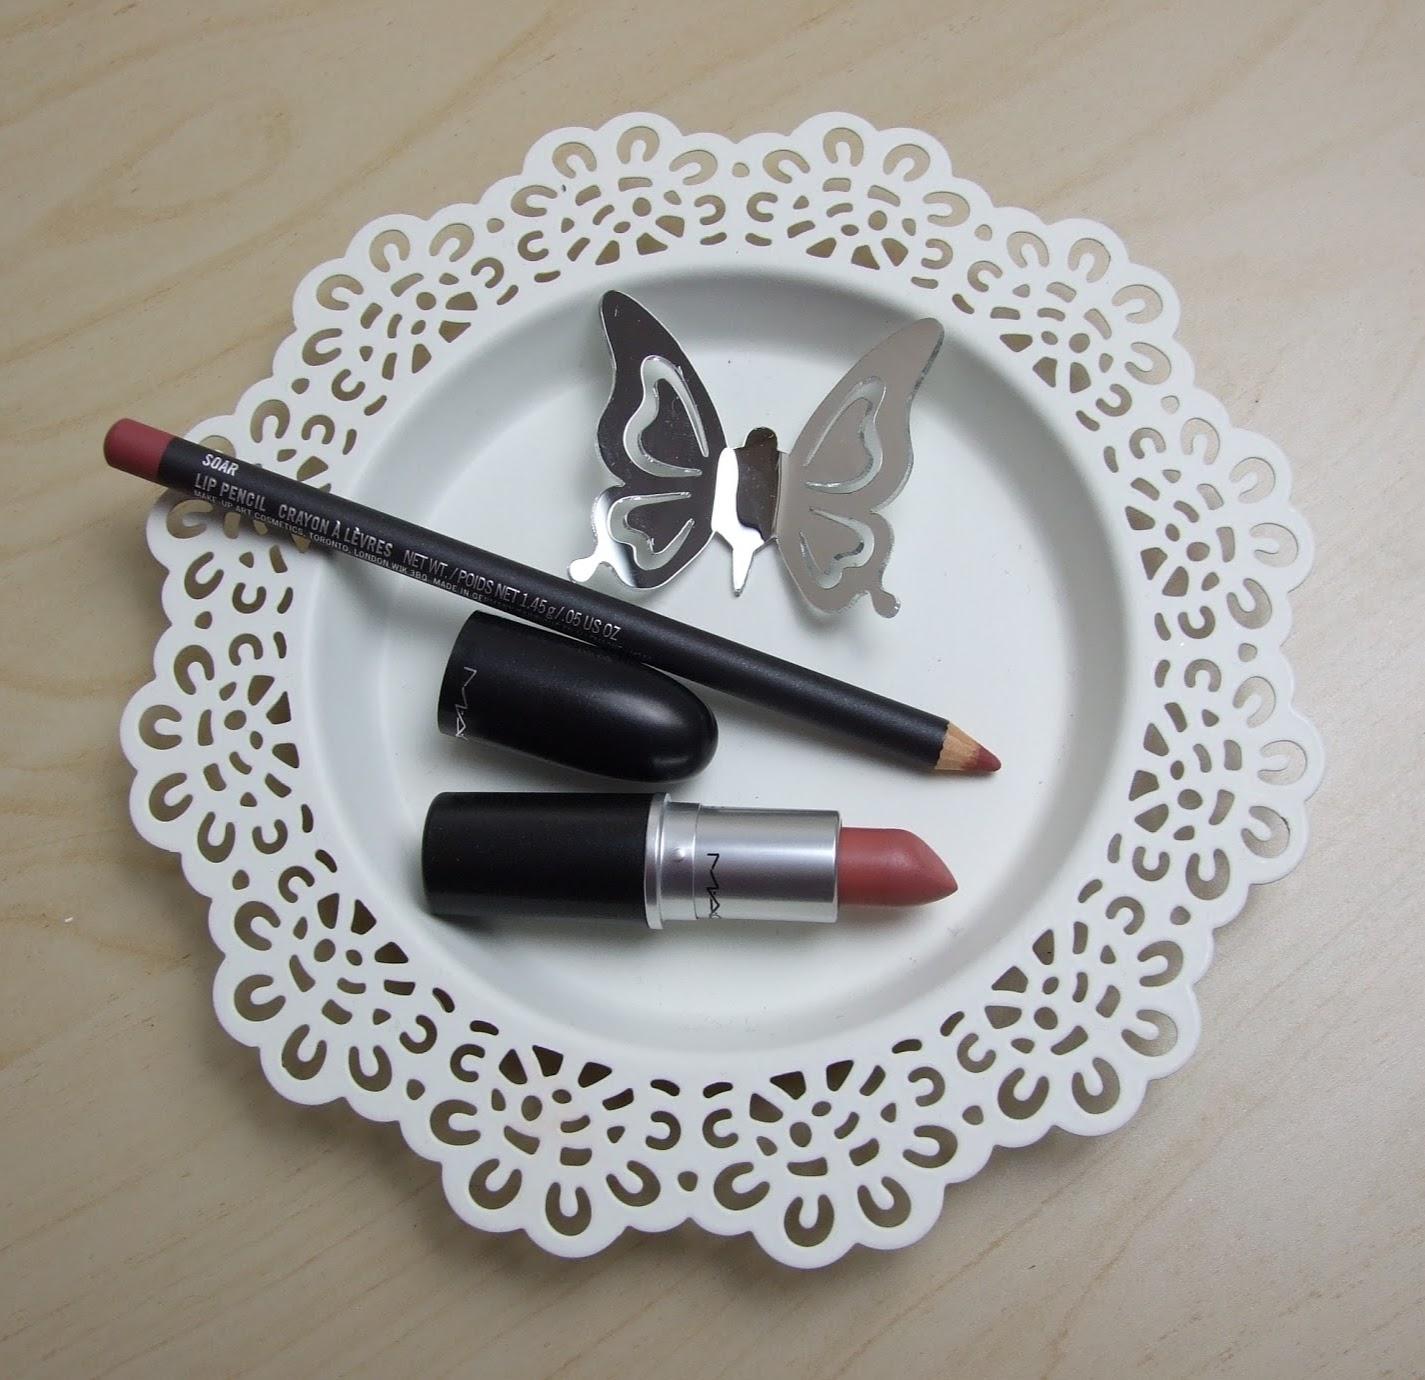 mac brave lipstick soar lip liner beauty blog review kylie jenner